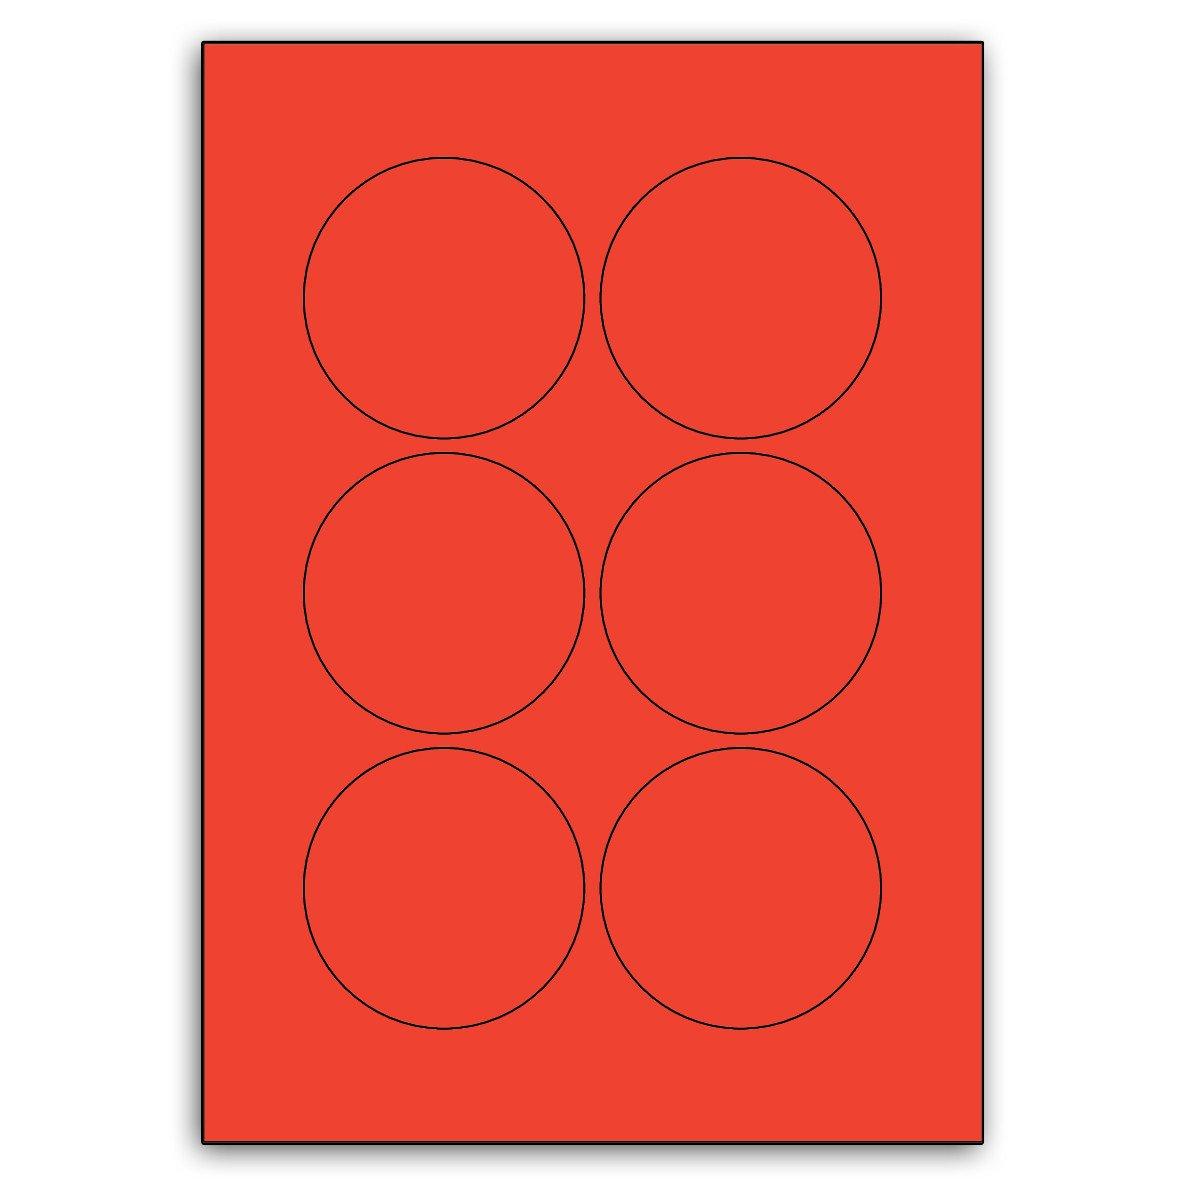 Multi Purpose rot Round Labels (73mm Diameter) - 6 Labels Labels Labels Per Sheet - 100 Sheets B00BXE69YI      München  7a5d67